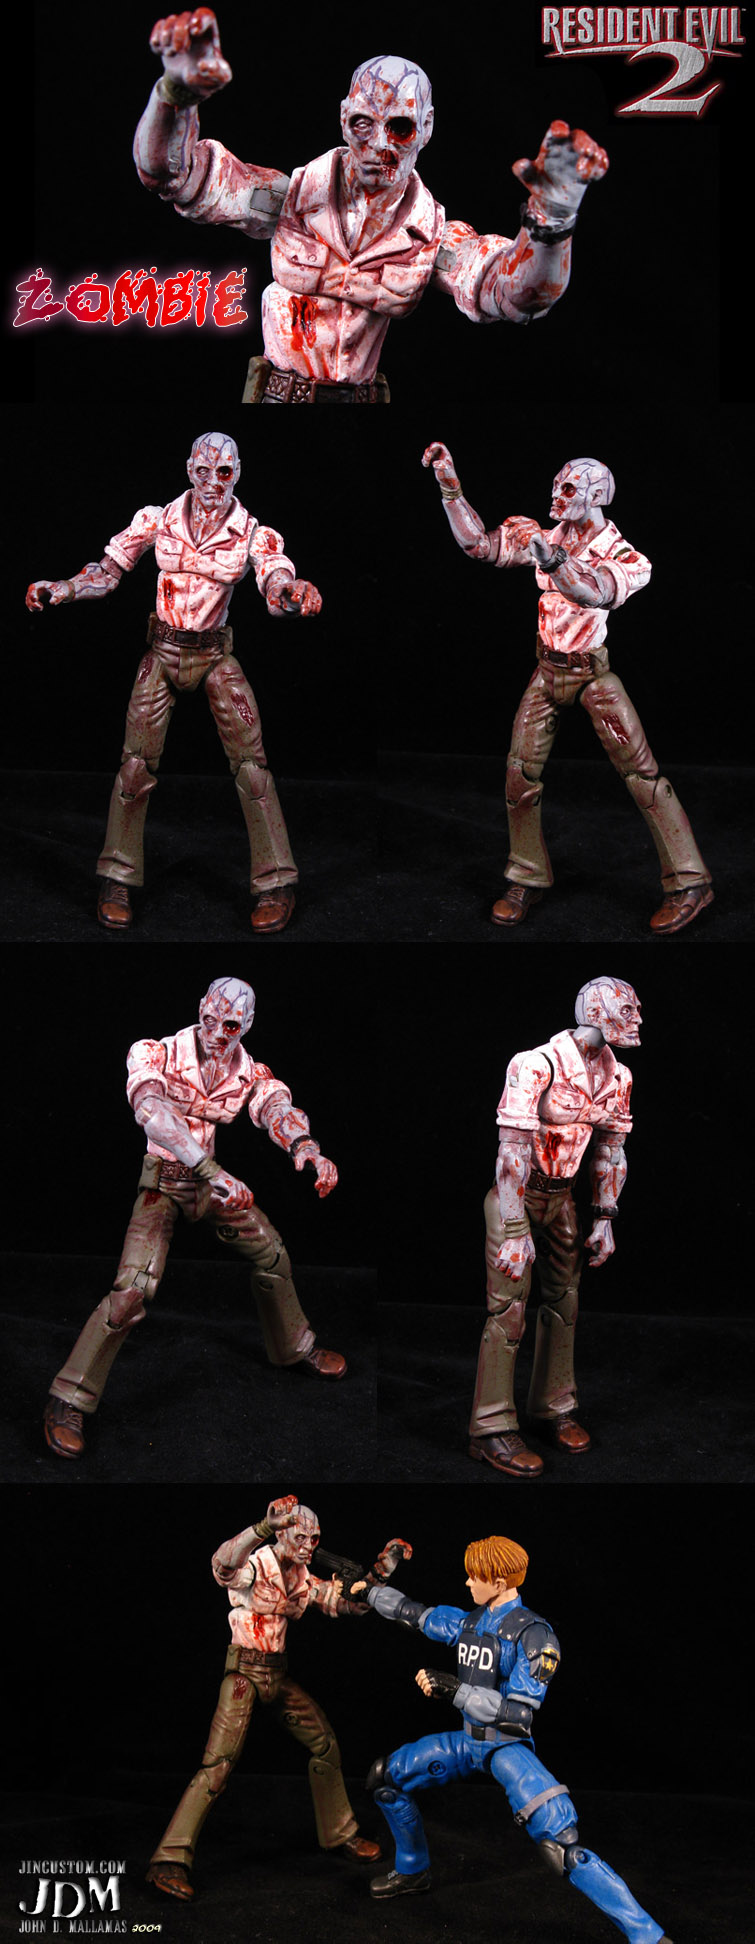 Zombie GI Joe